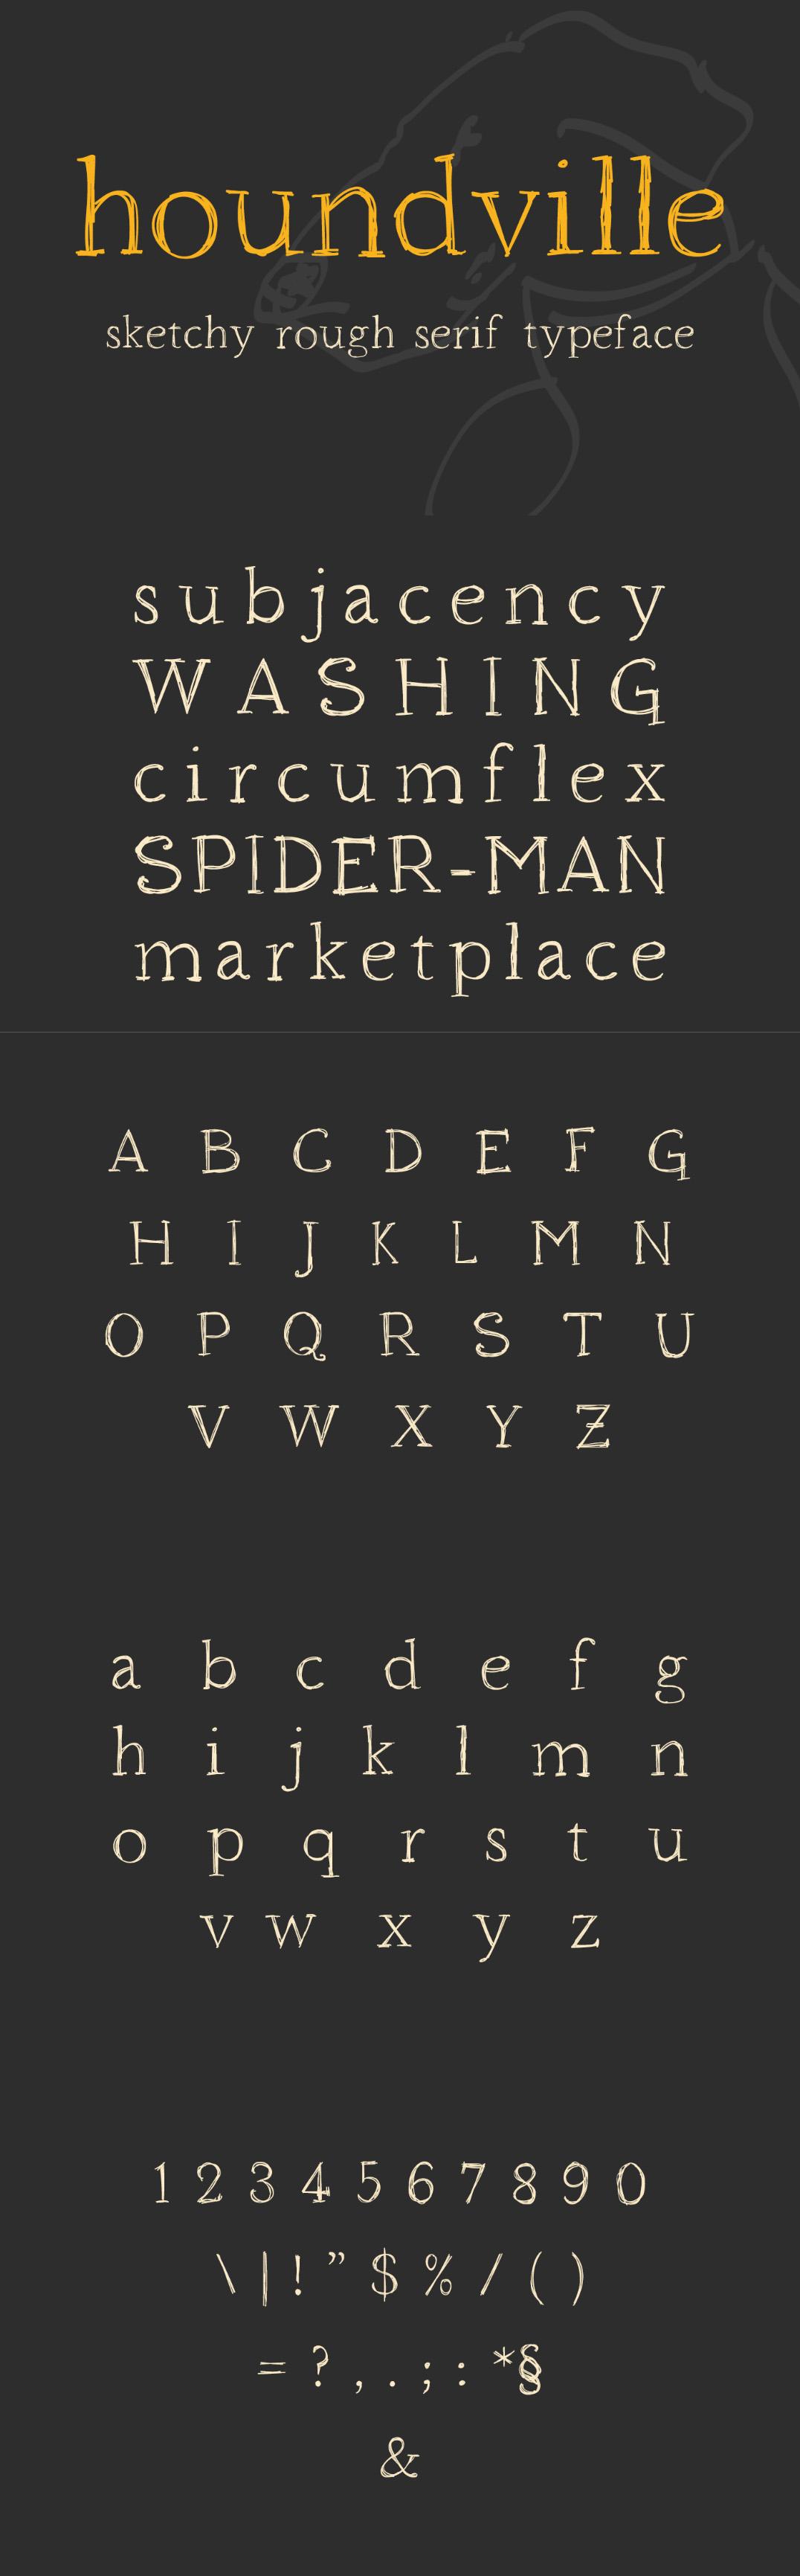 Houndville Font typeface